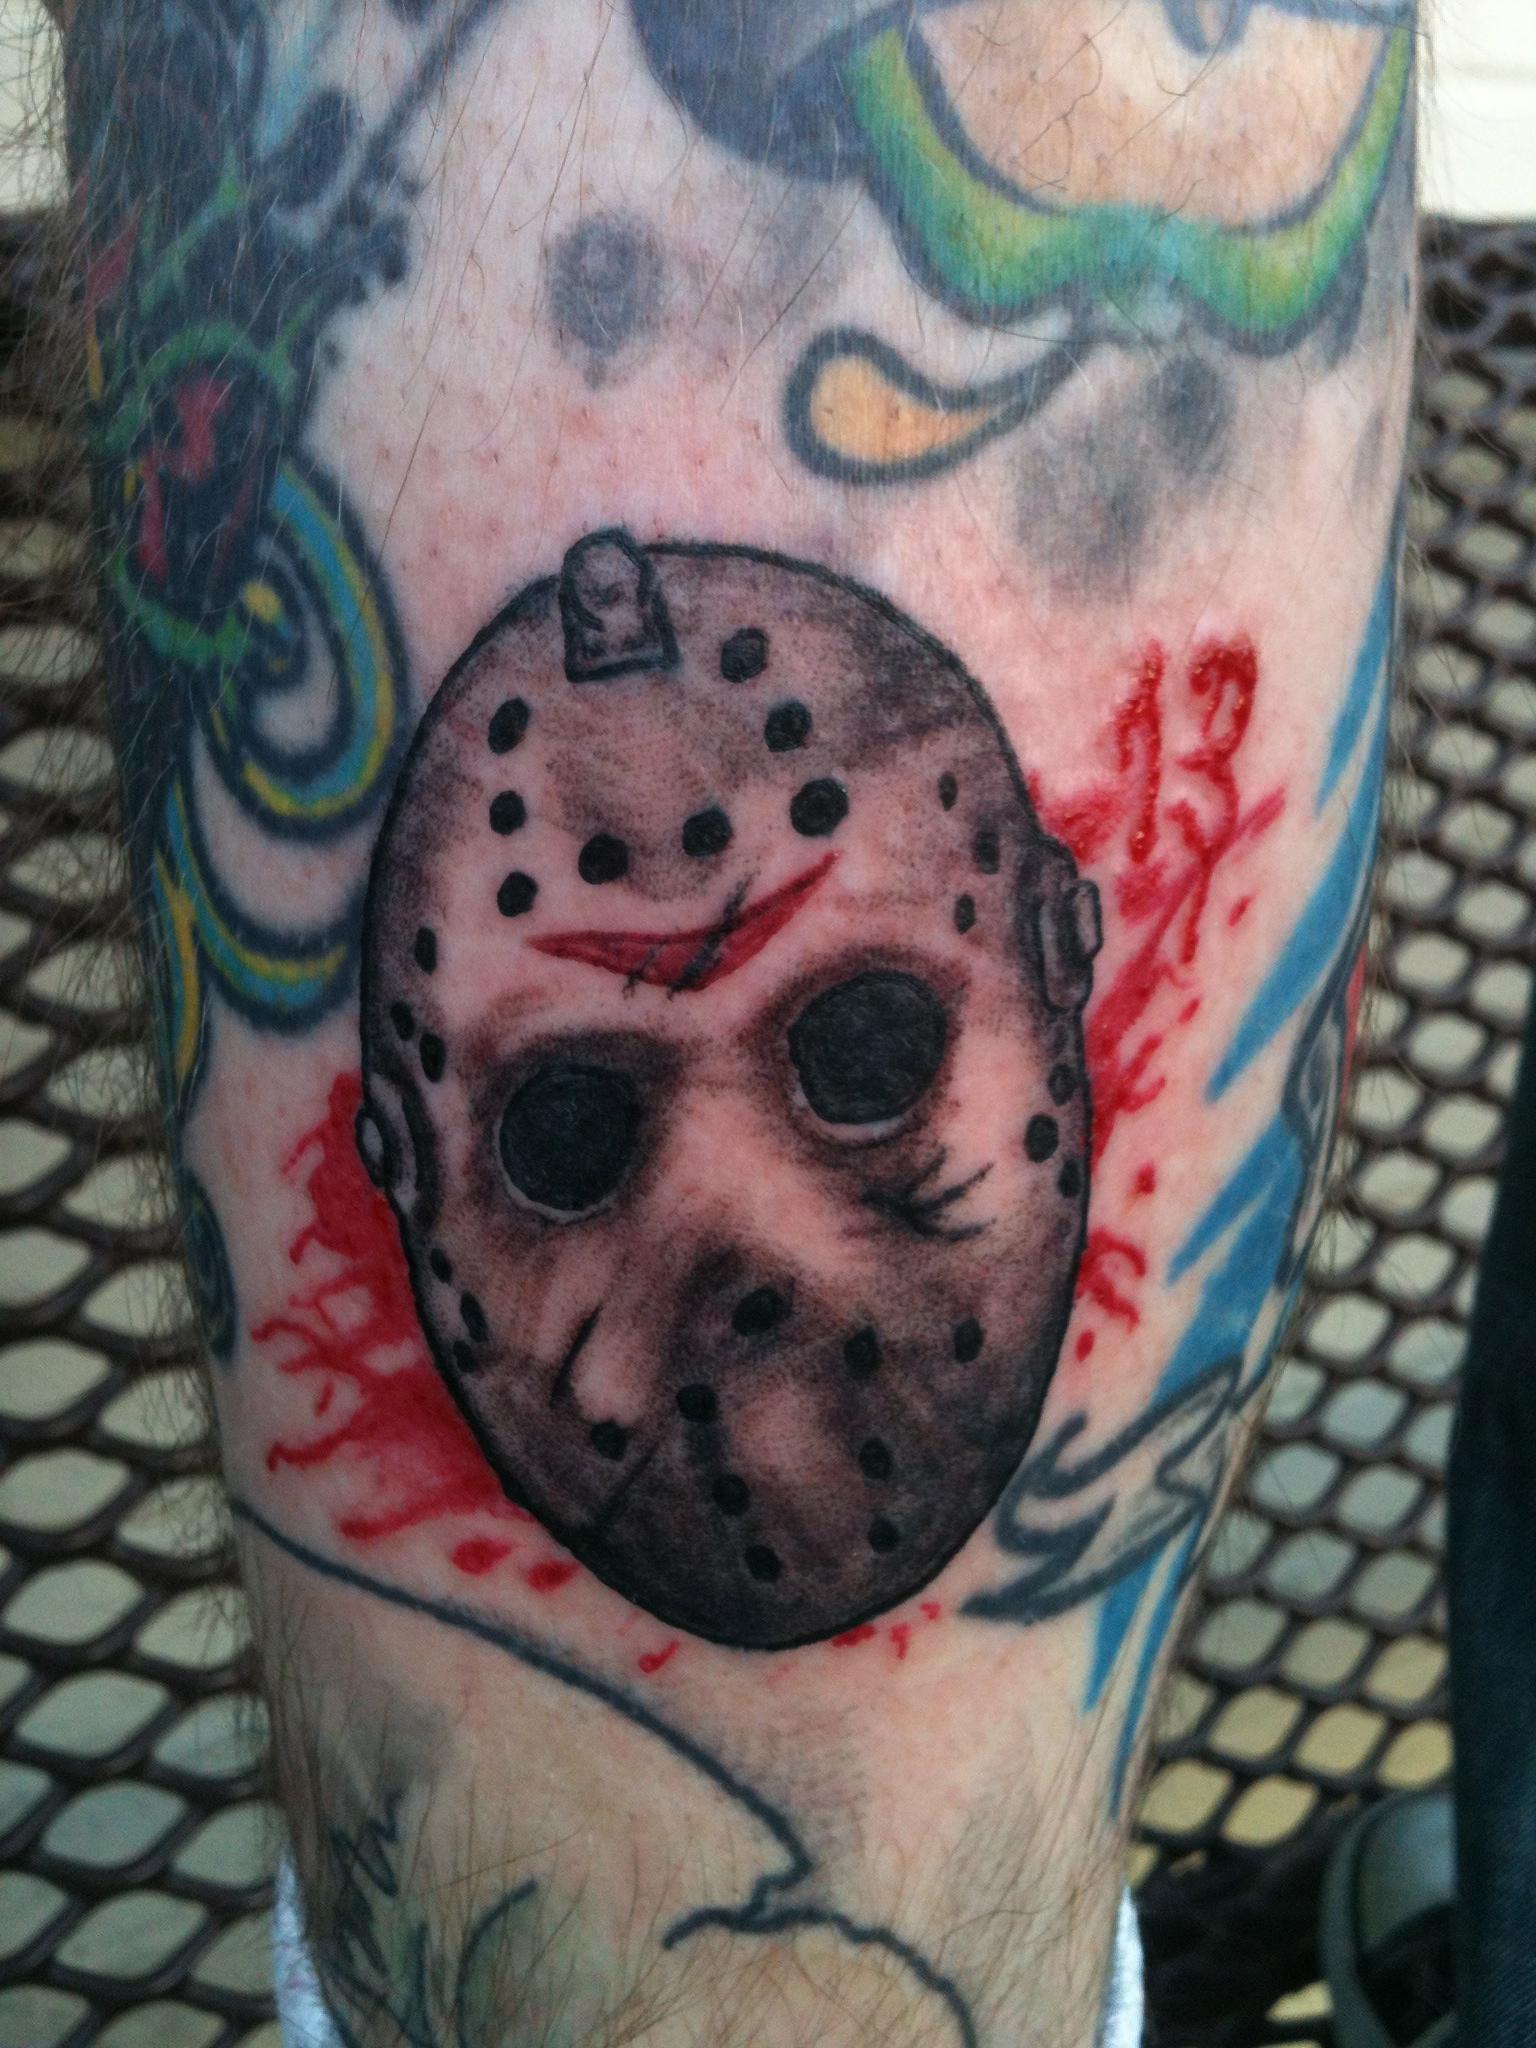 Jason in a Hockey Mask